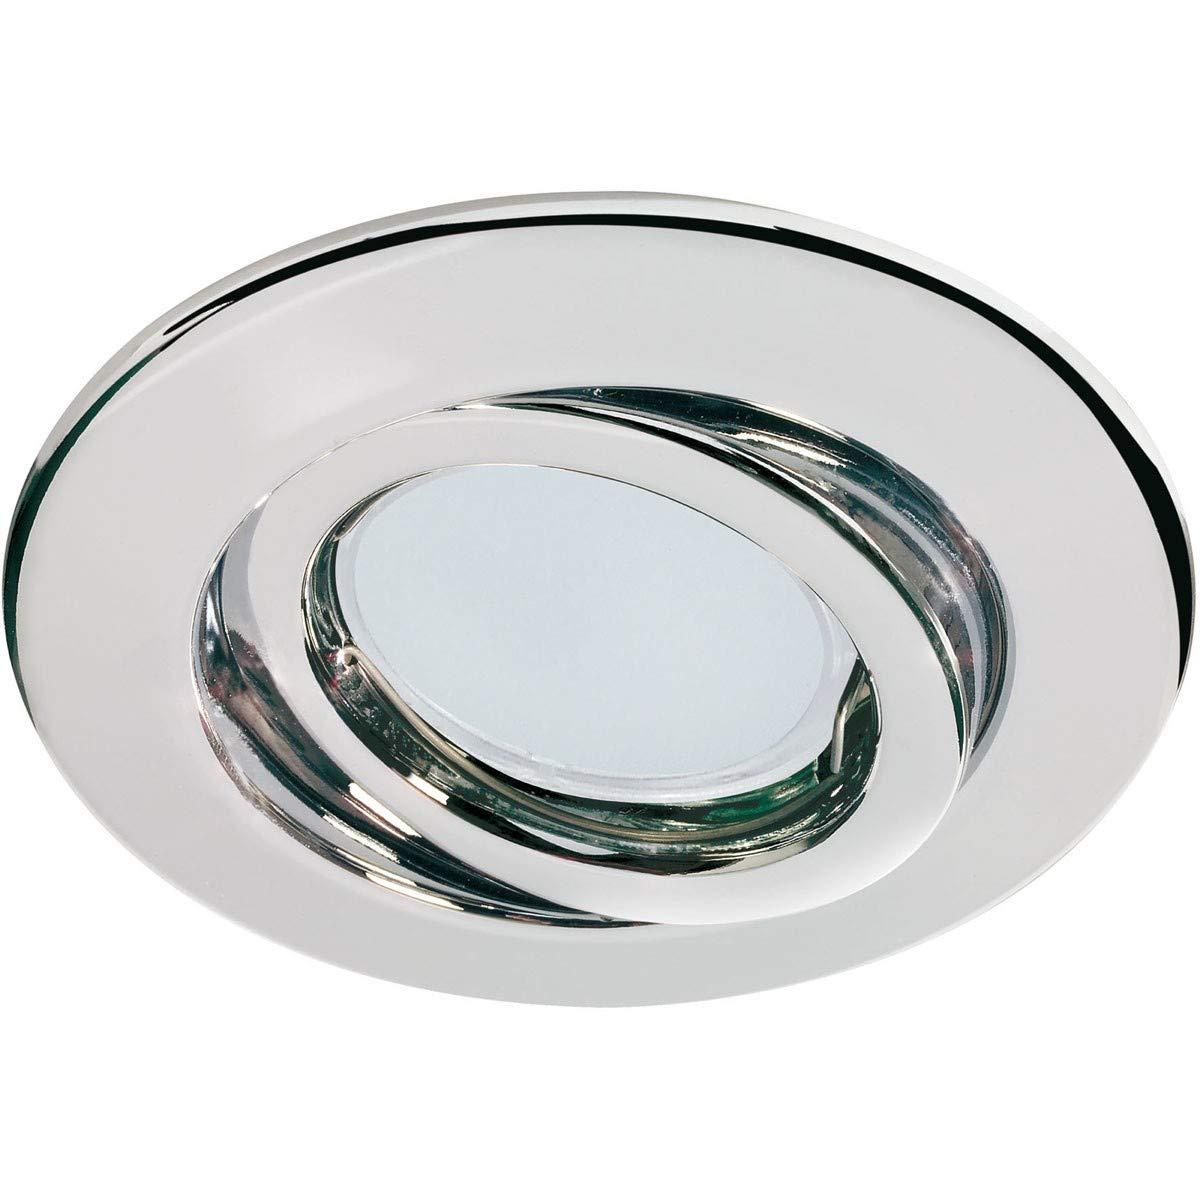 Quality line recessed light set, Energy Saving Chrome, Swivelling, 3 pc. set